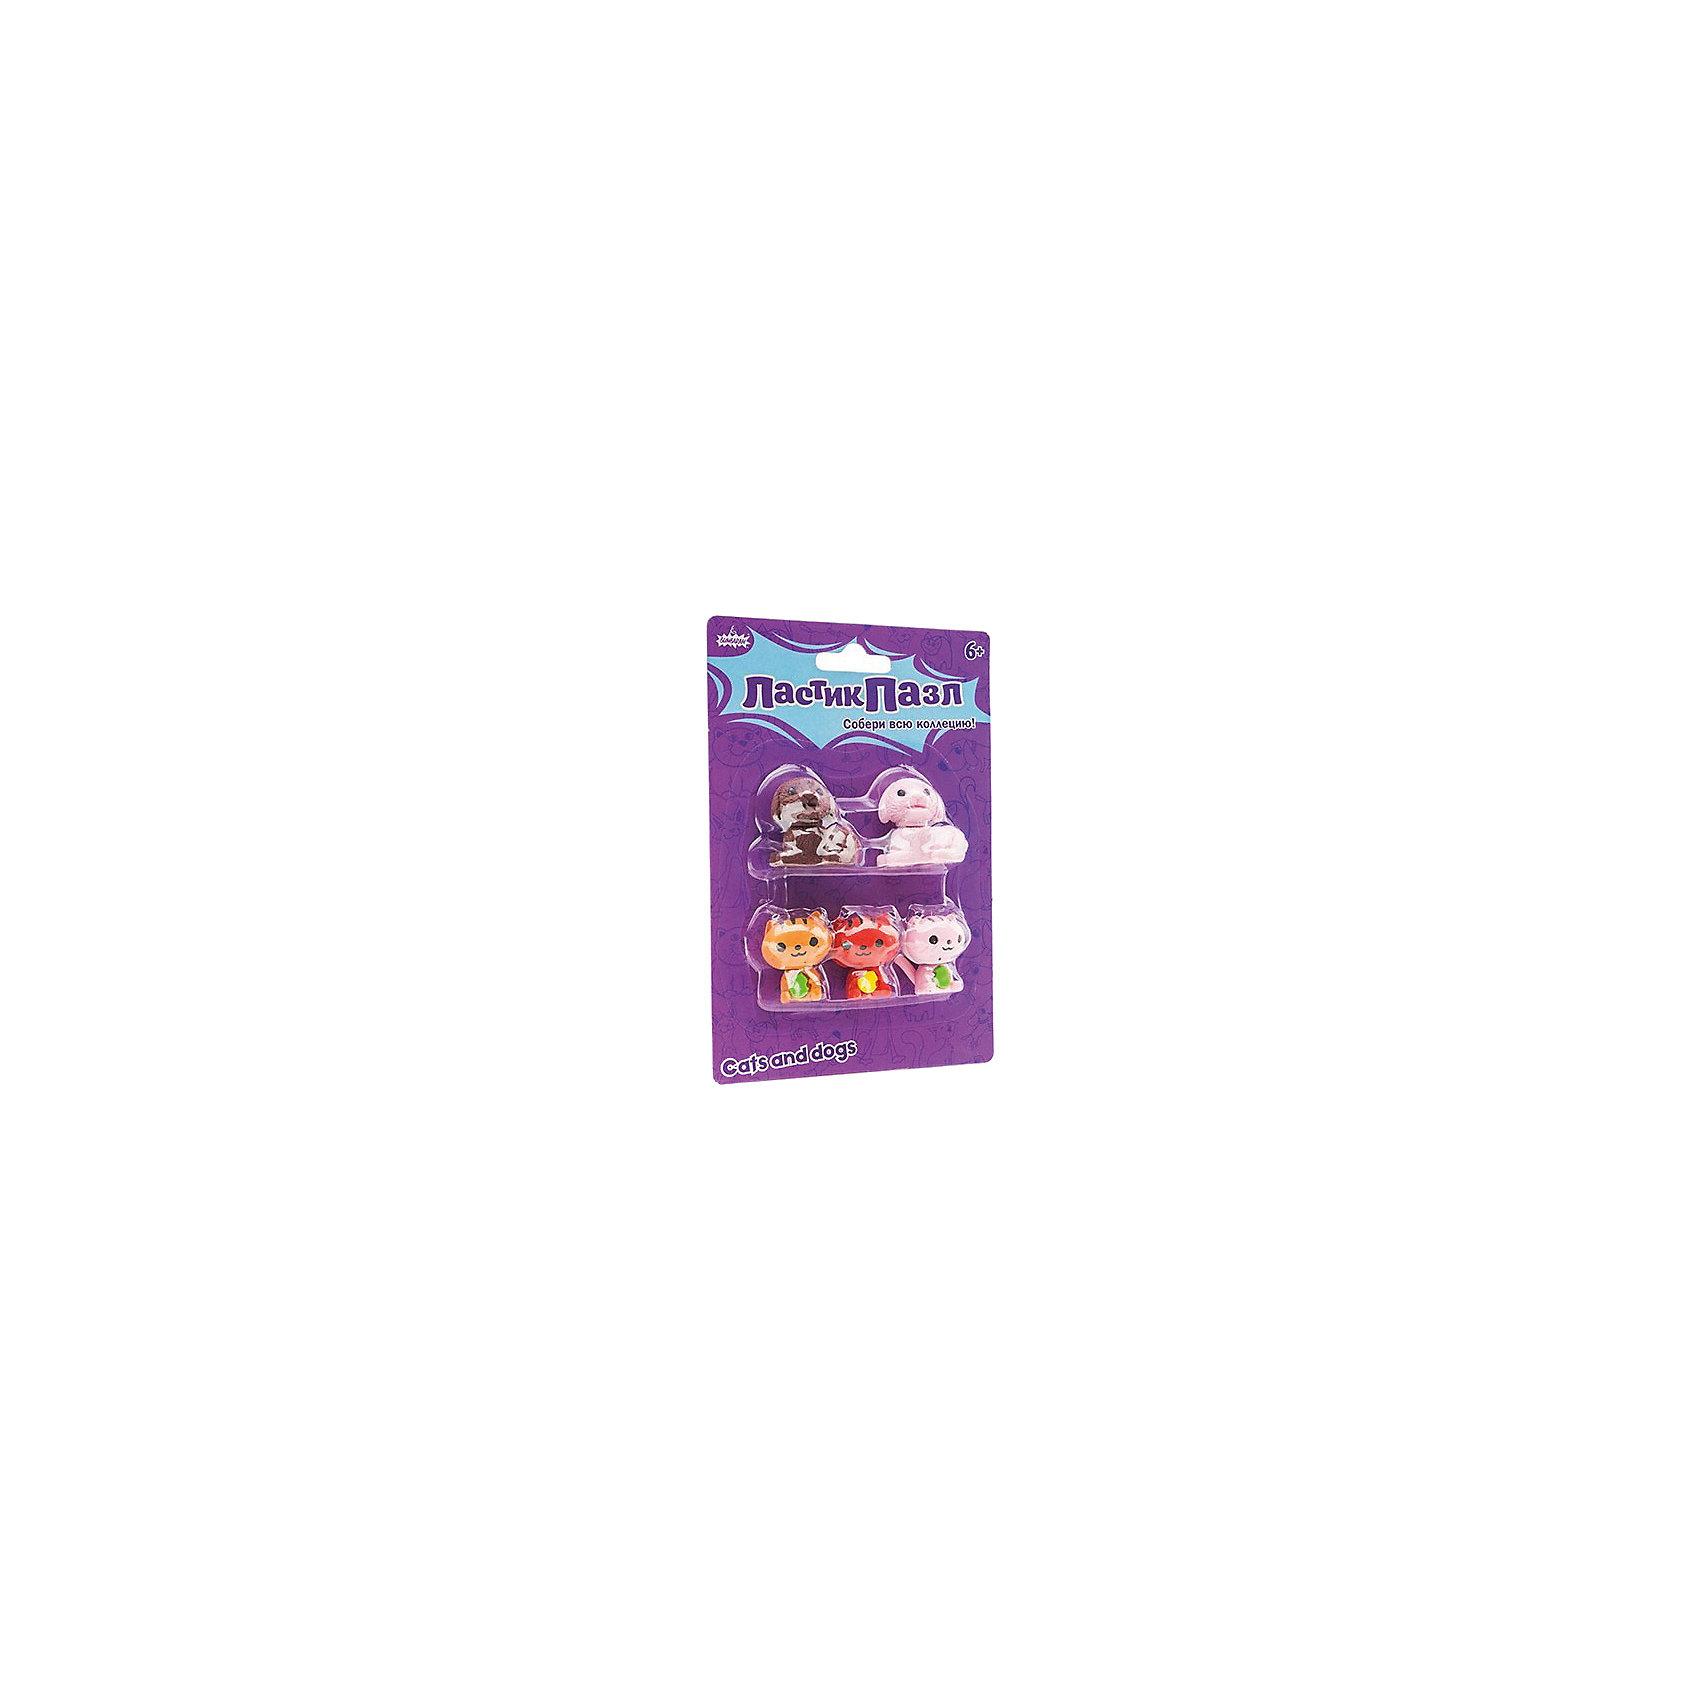 Бумбарам Набор фигурных ластиков Ластик-Пазл - Домашние любимцы Бумбарам бумбарам набор ластик пазл кухня бумбарам